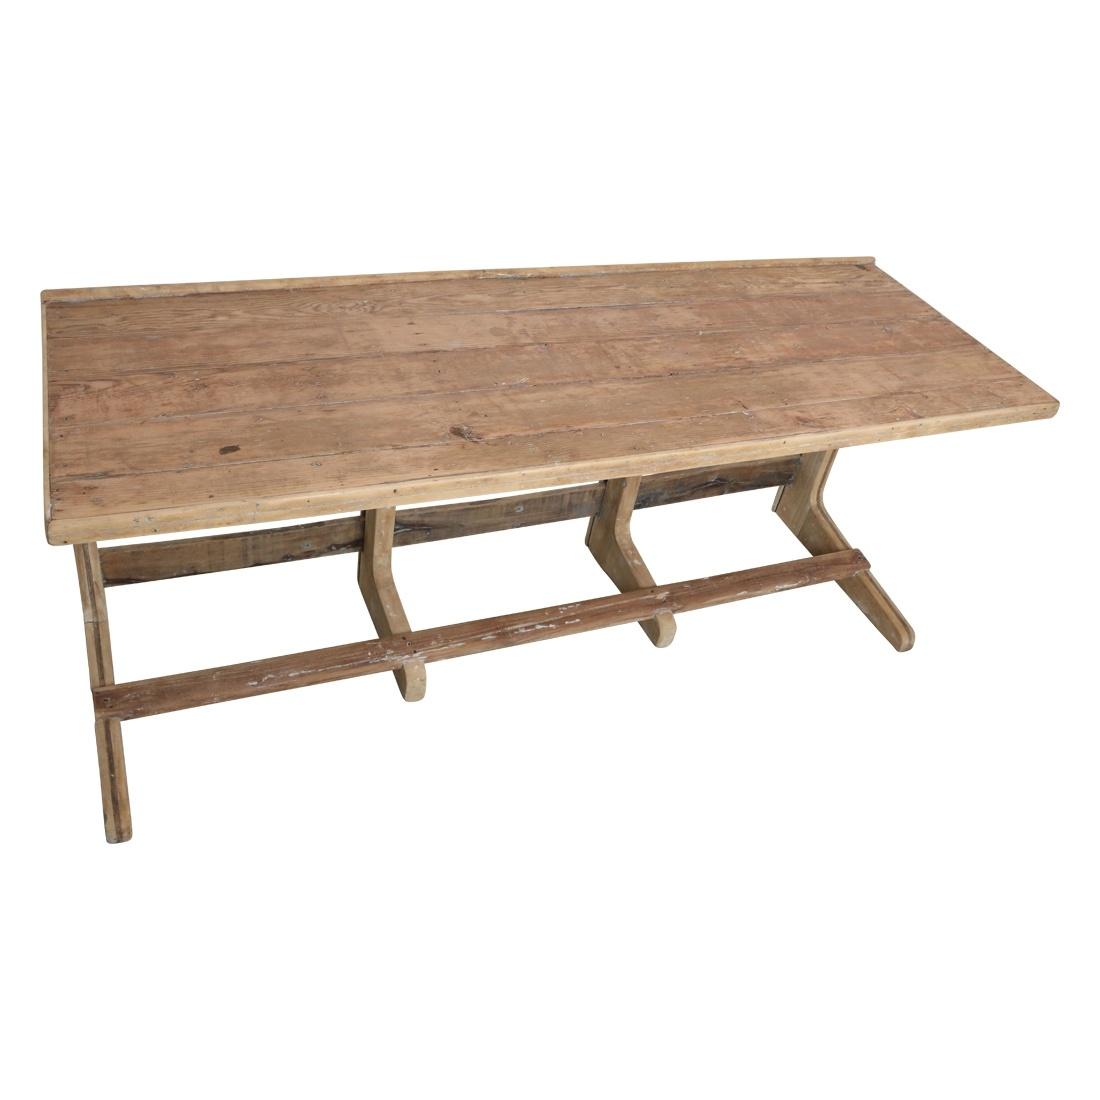 Oneworld Interiors XL natural washed long desk / table Vintage - 183x61x78m - Unique item